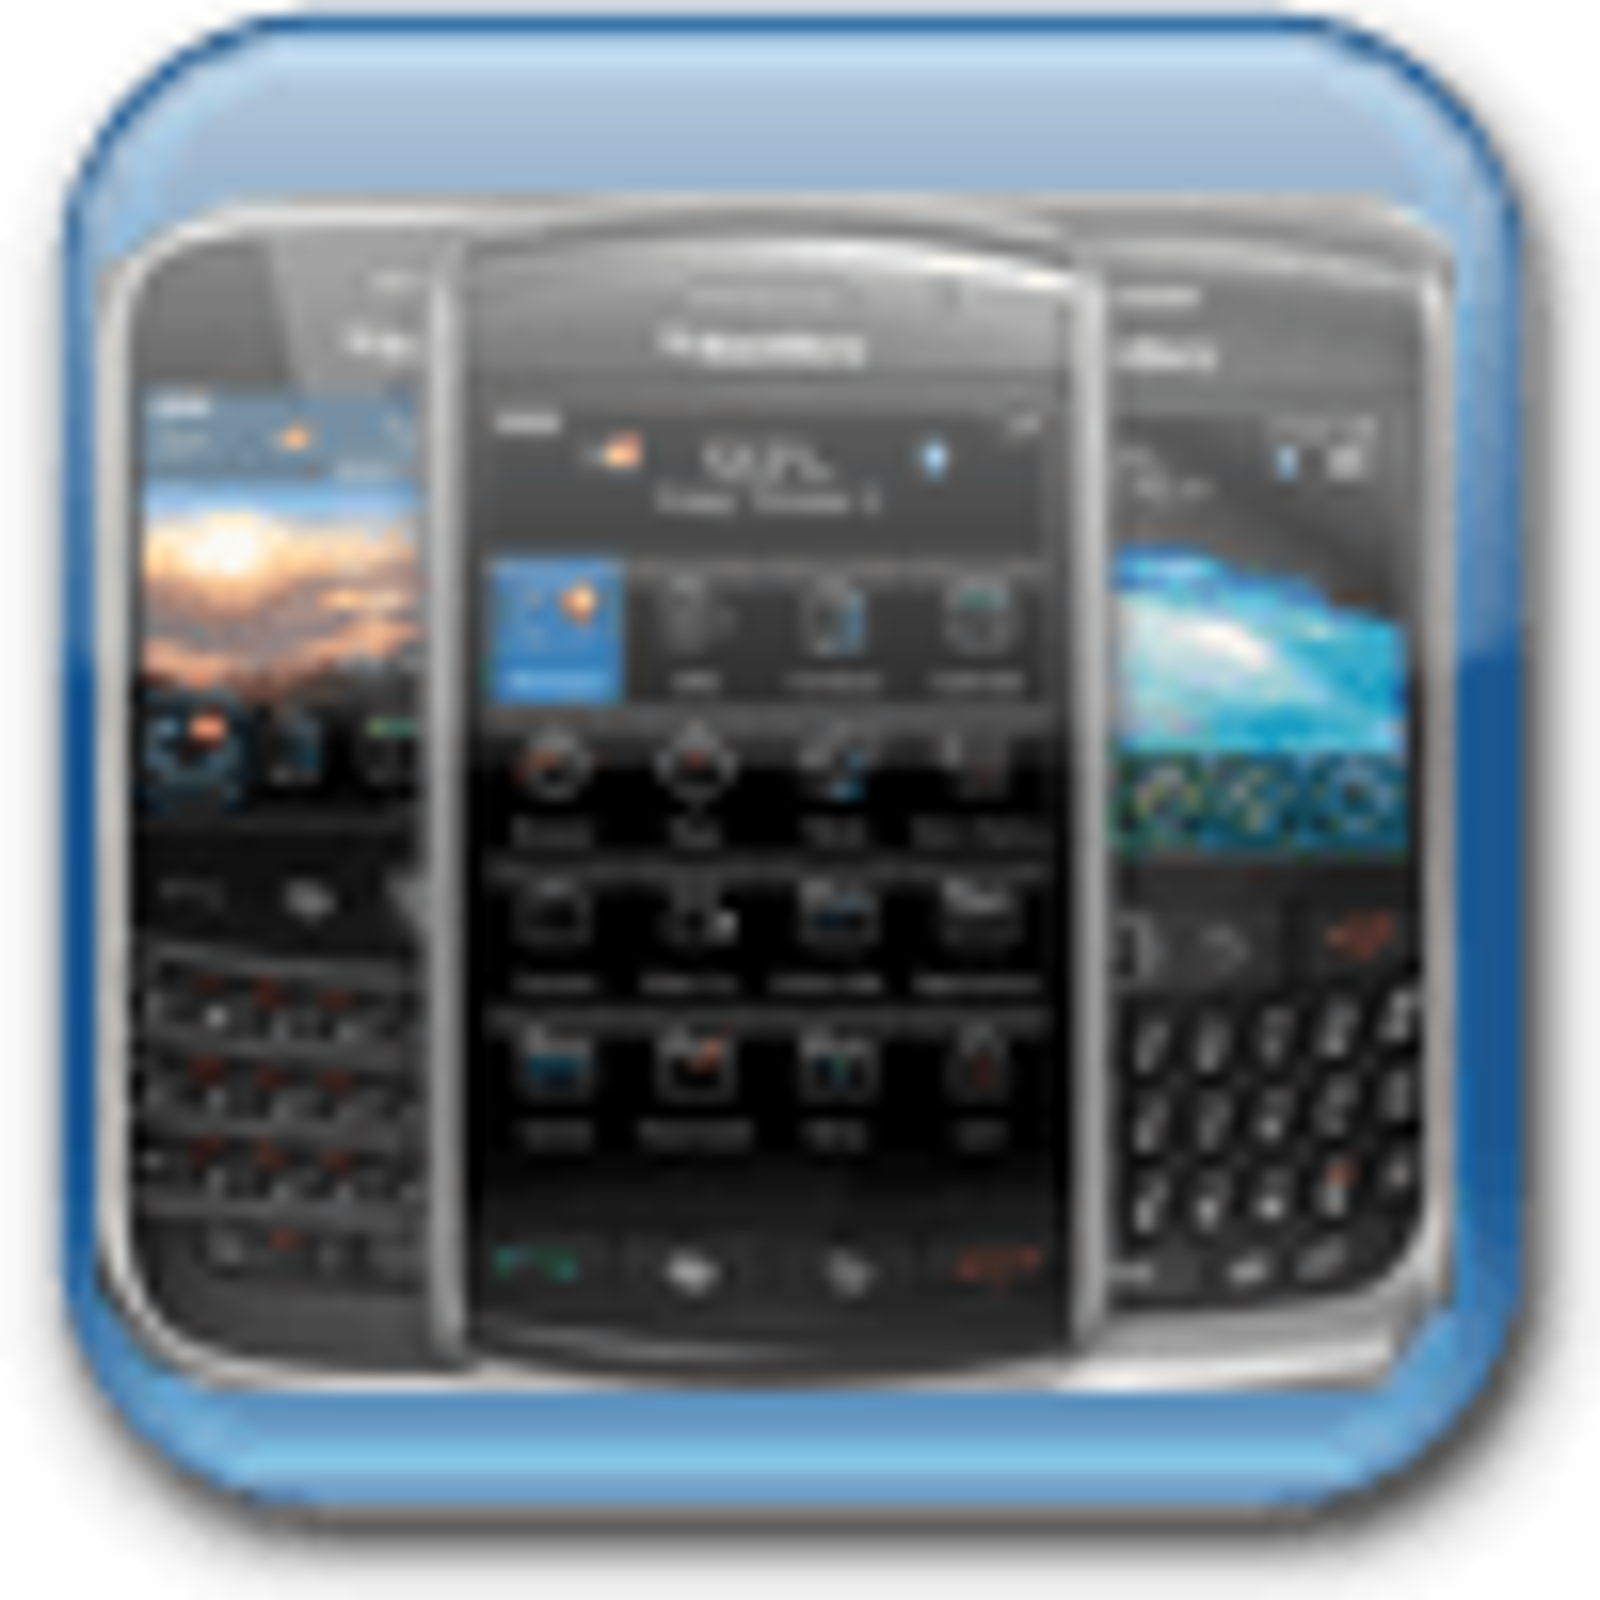 Videora BlackBerry Bold Converter